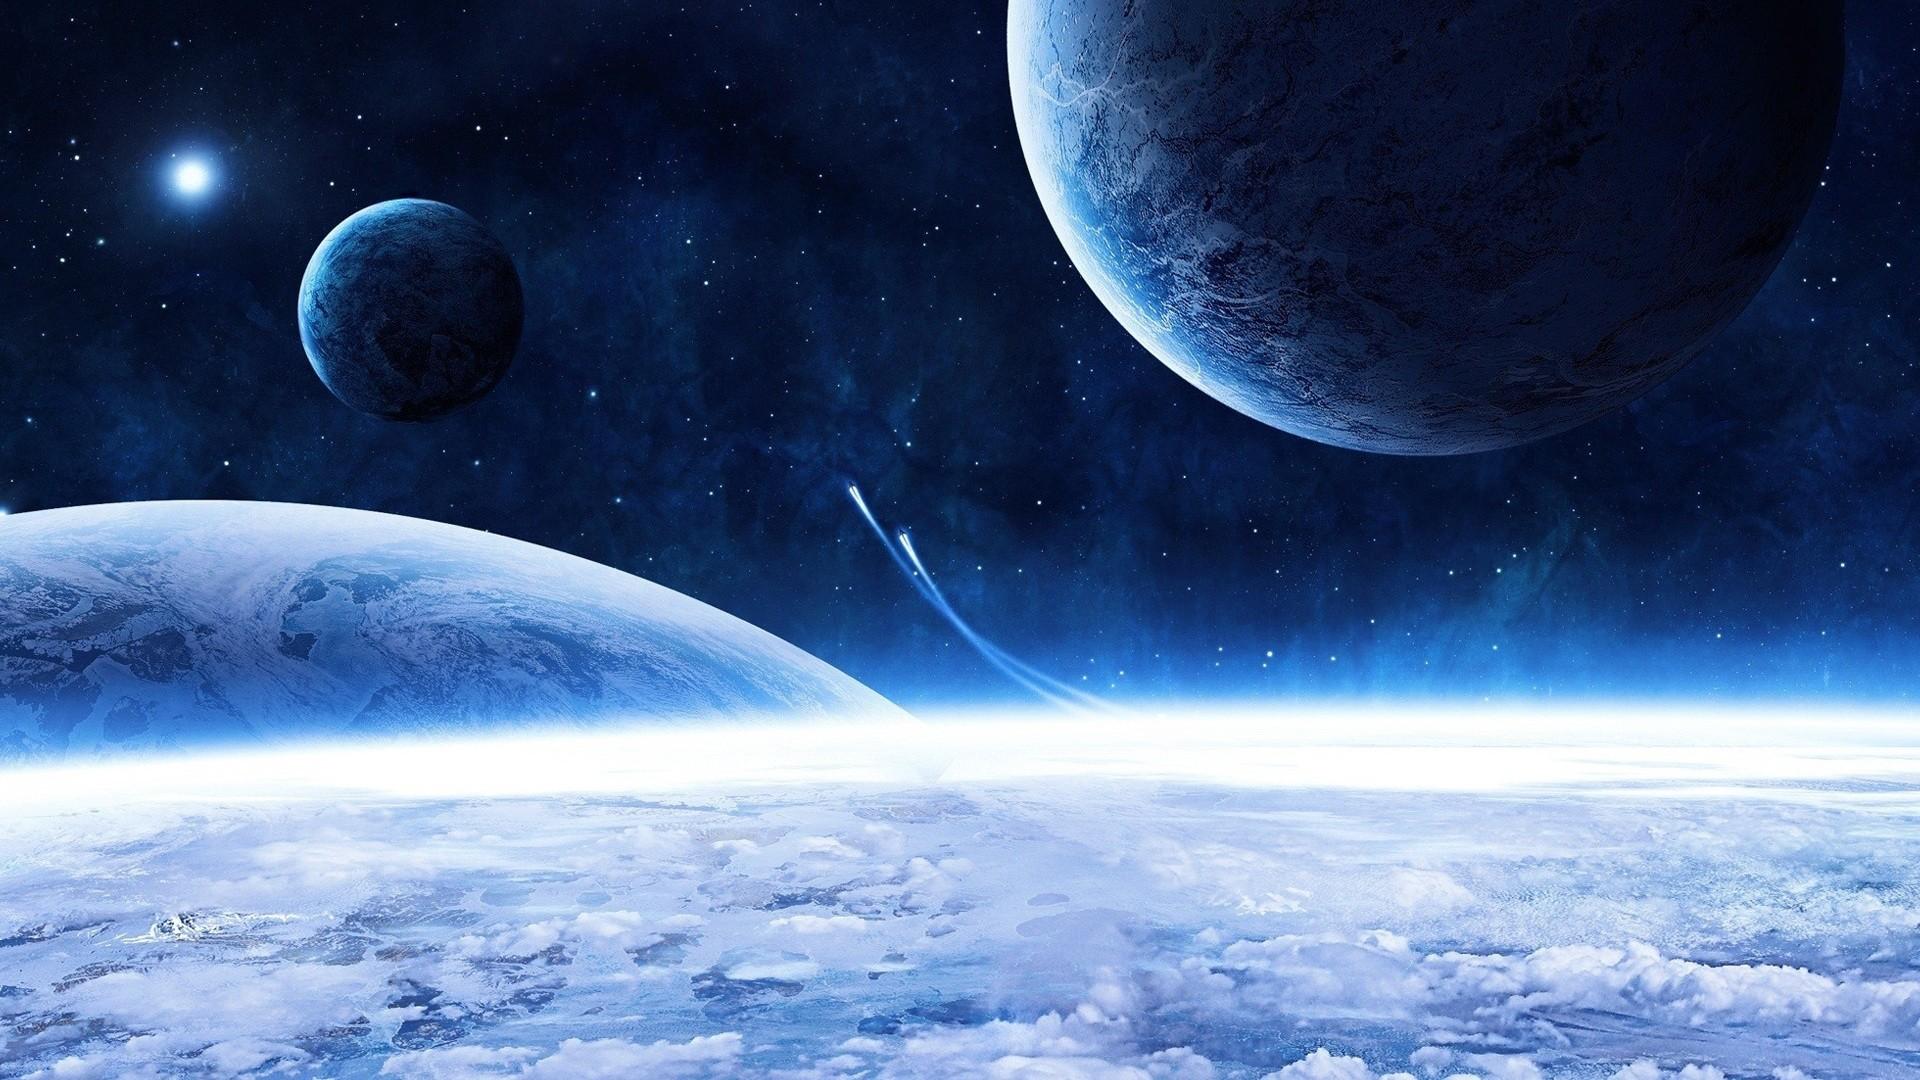 Blue Space Wallpaper 5760